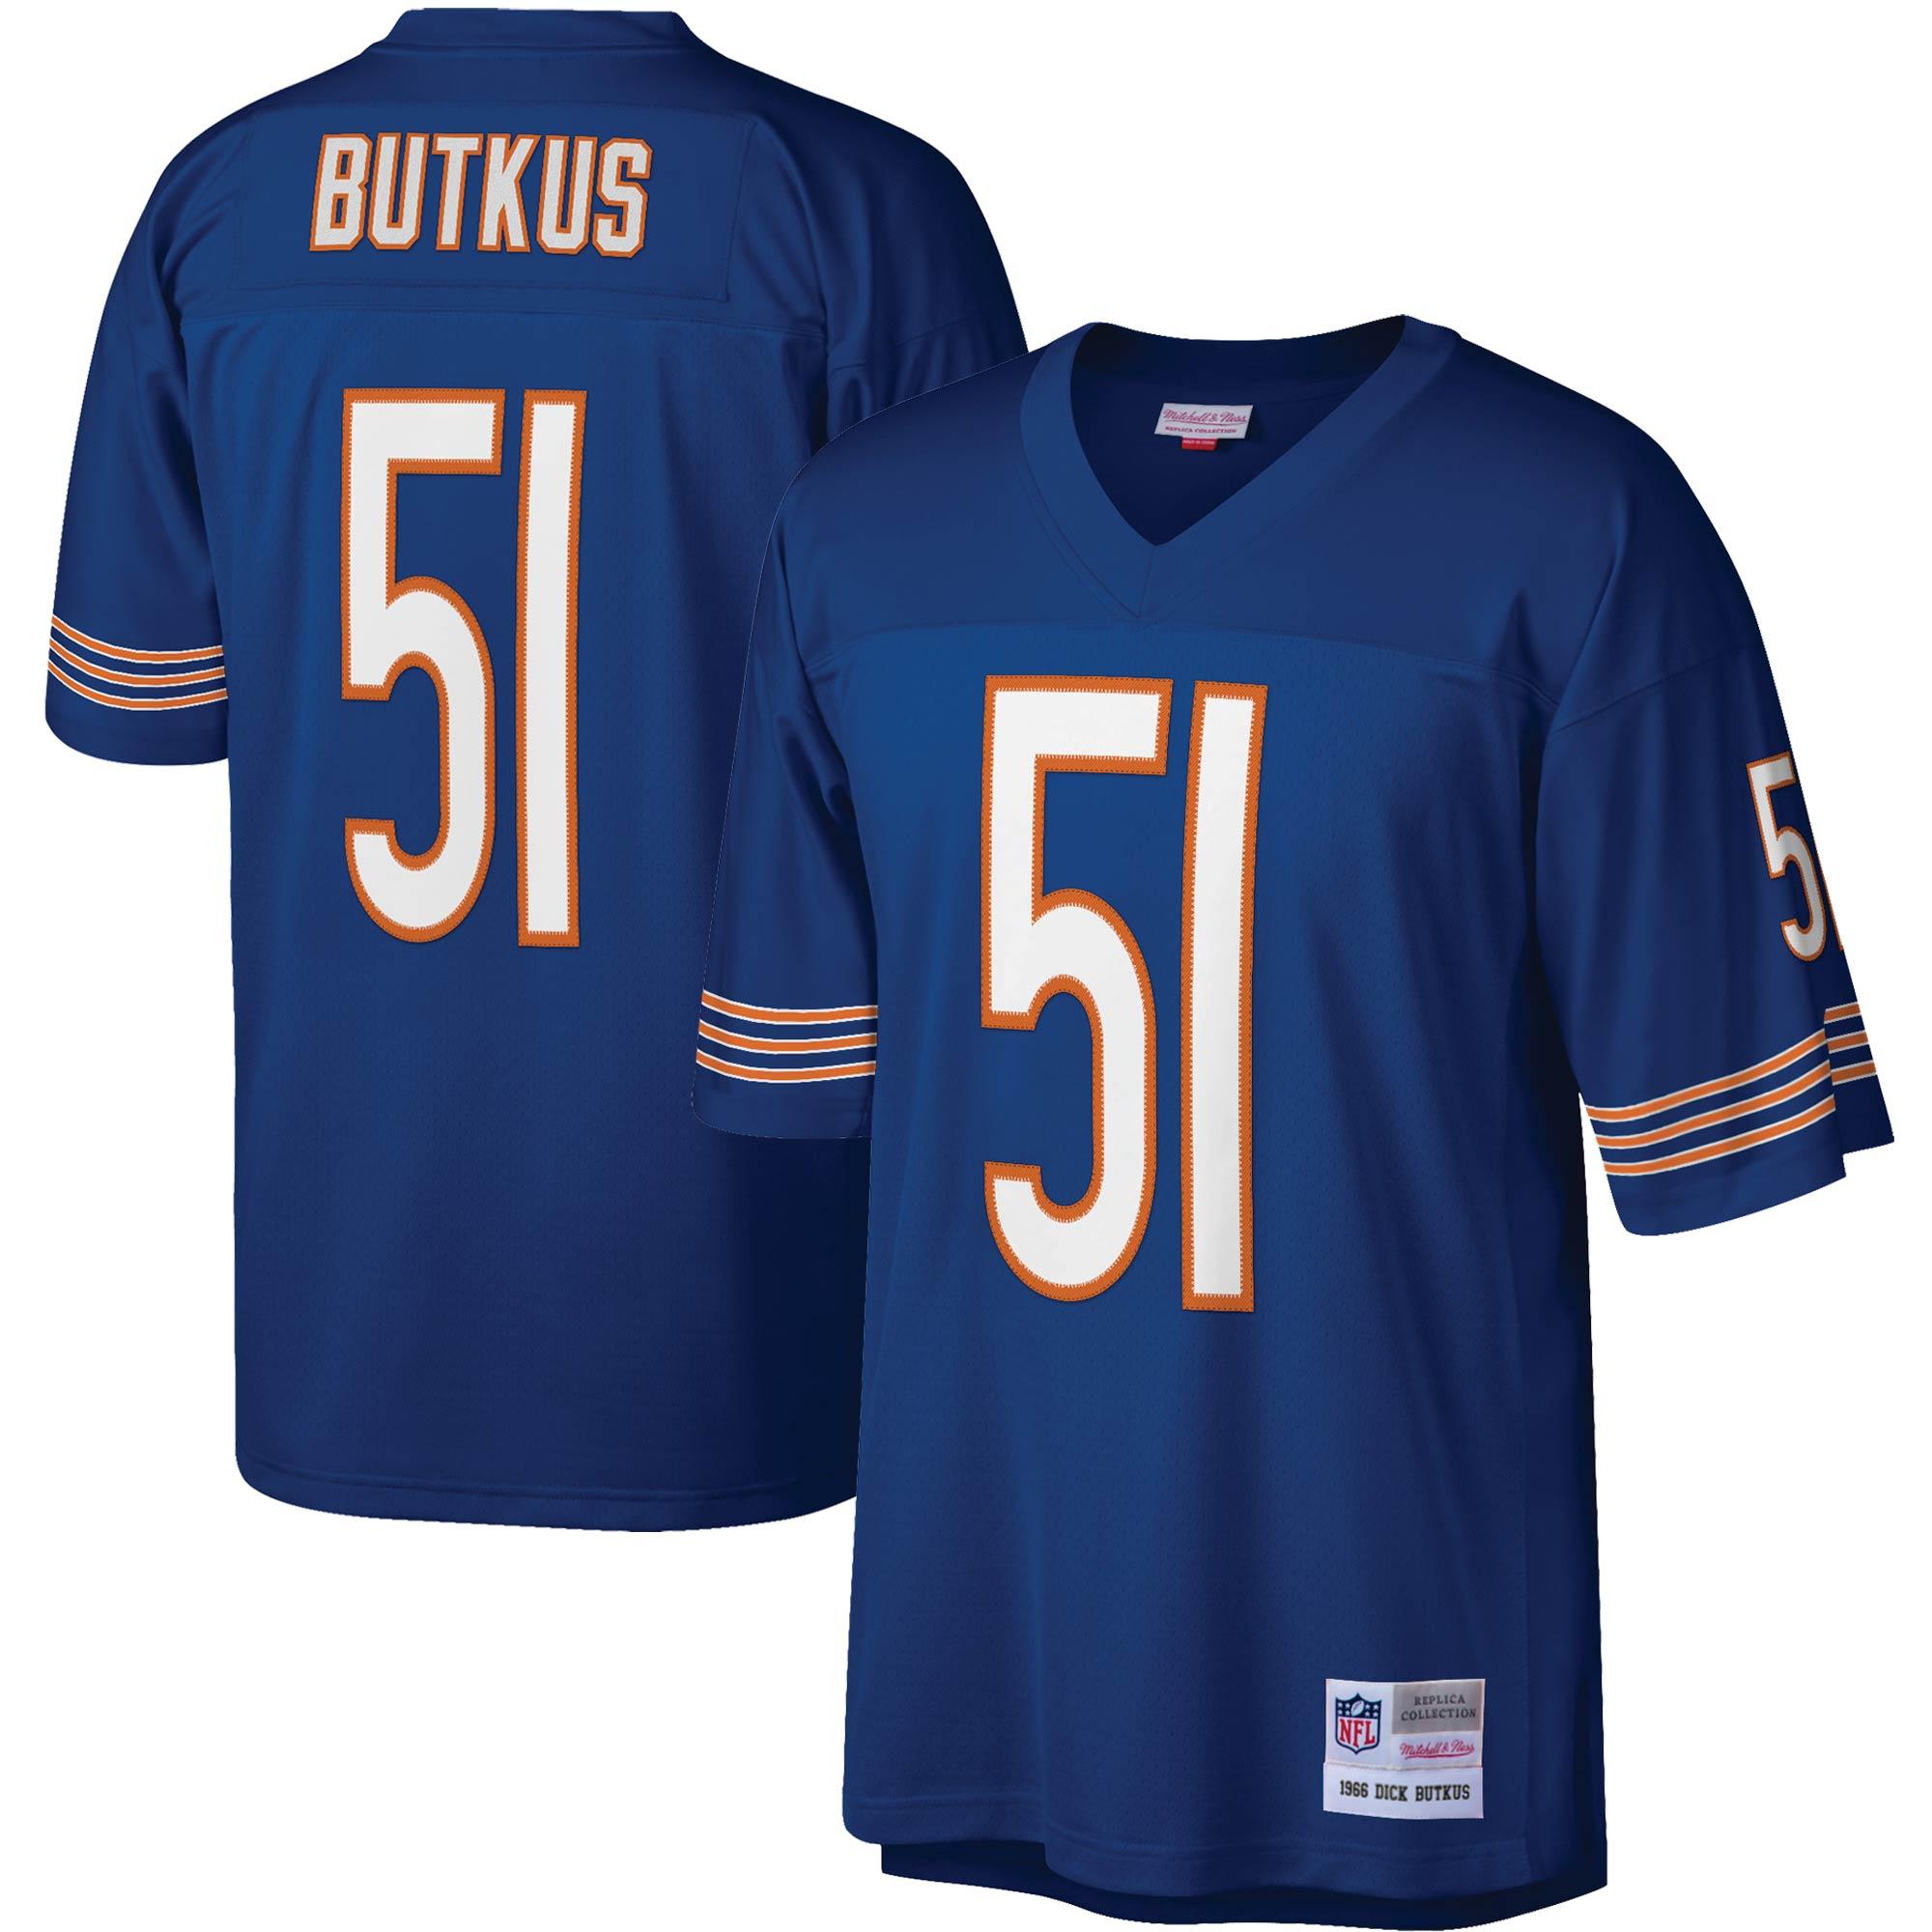 Dick Butkus Chicago Bears Mitchell & Ness Legacy Replica Jersey - Navy